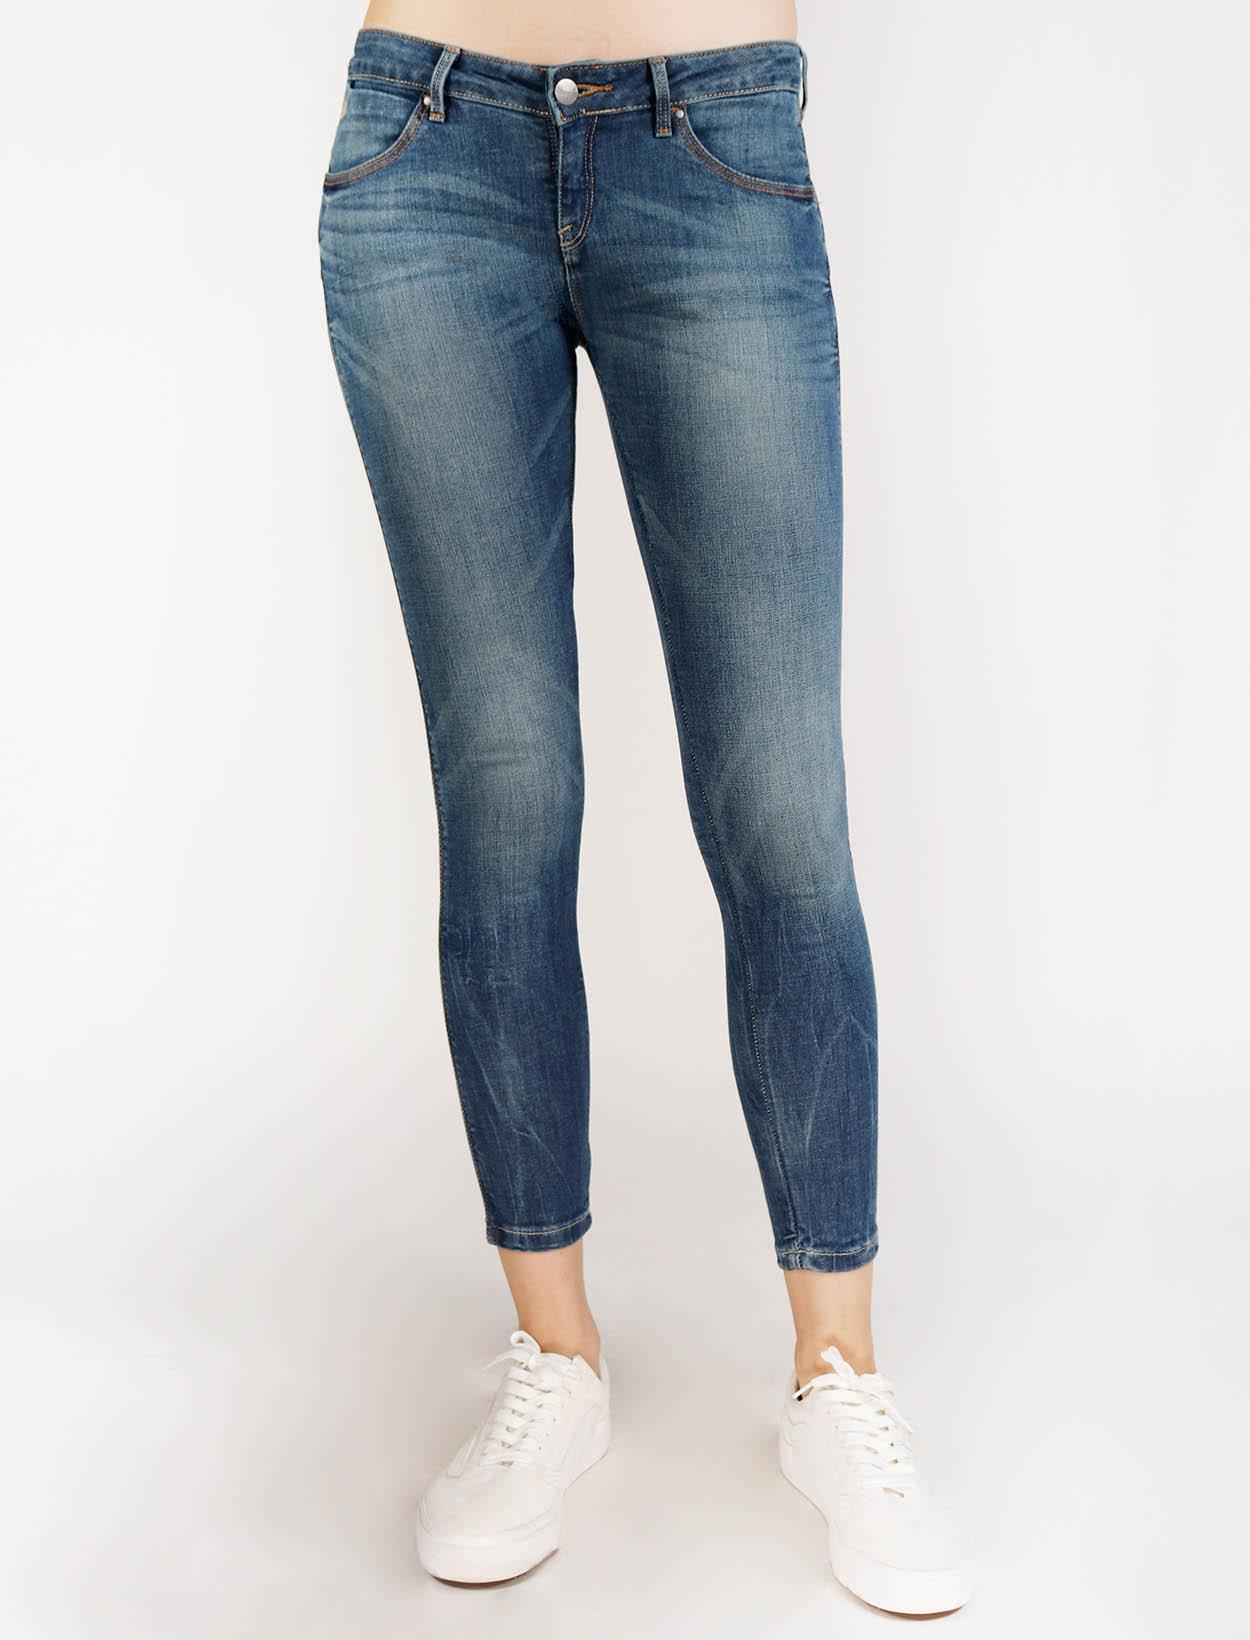 bebc1ca2 Wrangler Basic Five Pocket Low Rise Skinny Jeans in Medium Wash with  Organic Cotton Eco Sensitive